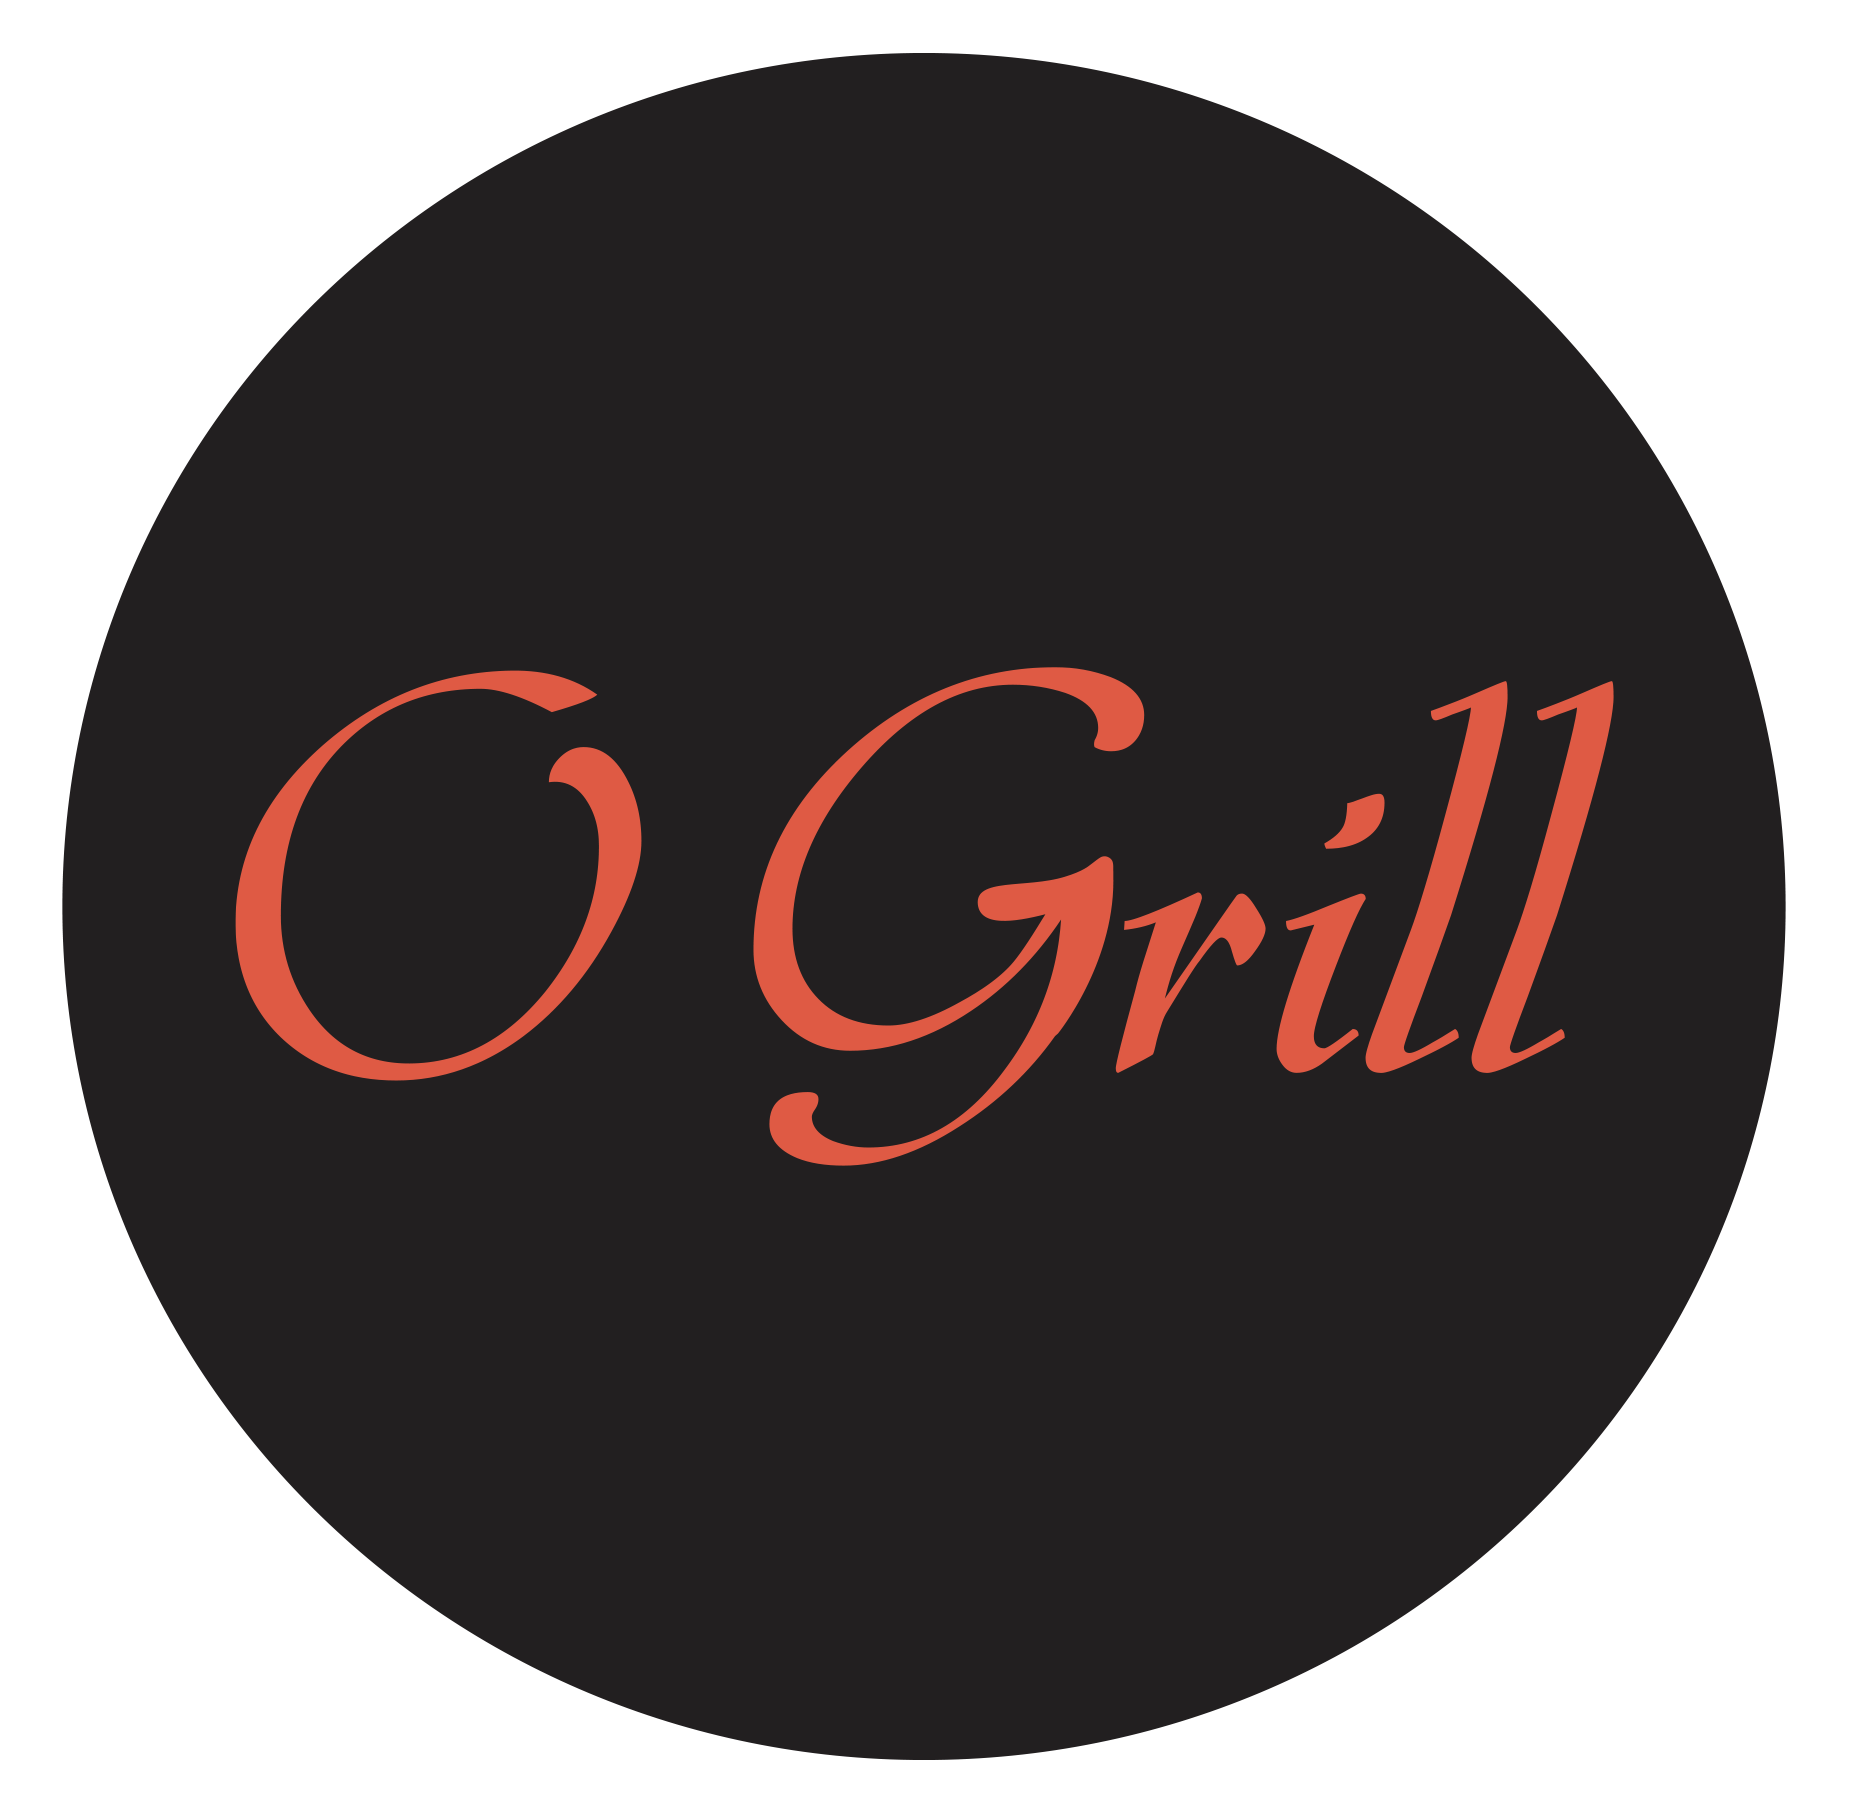 Ogrill-logo-groupejerecois